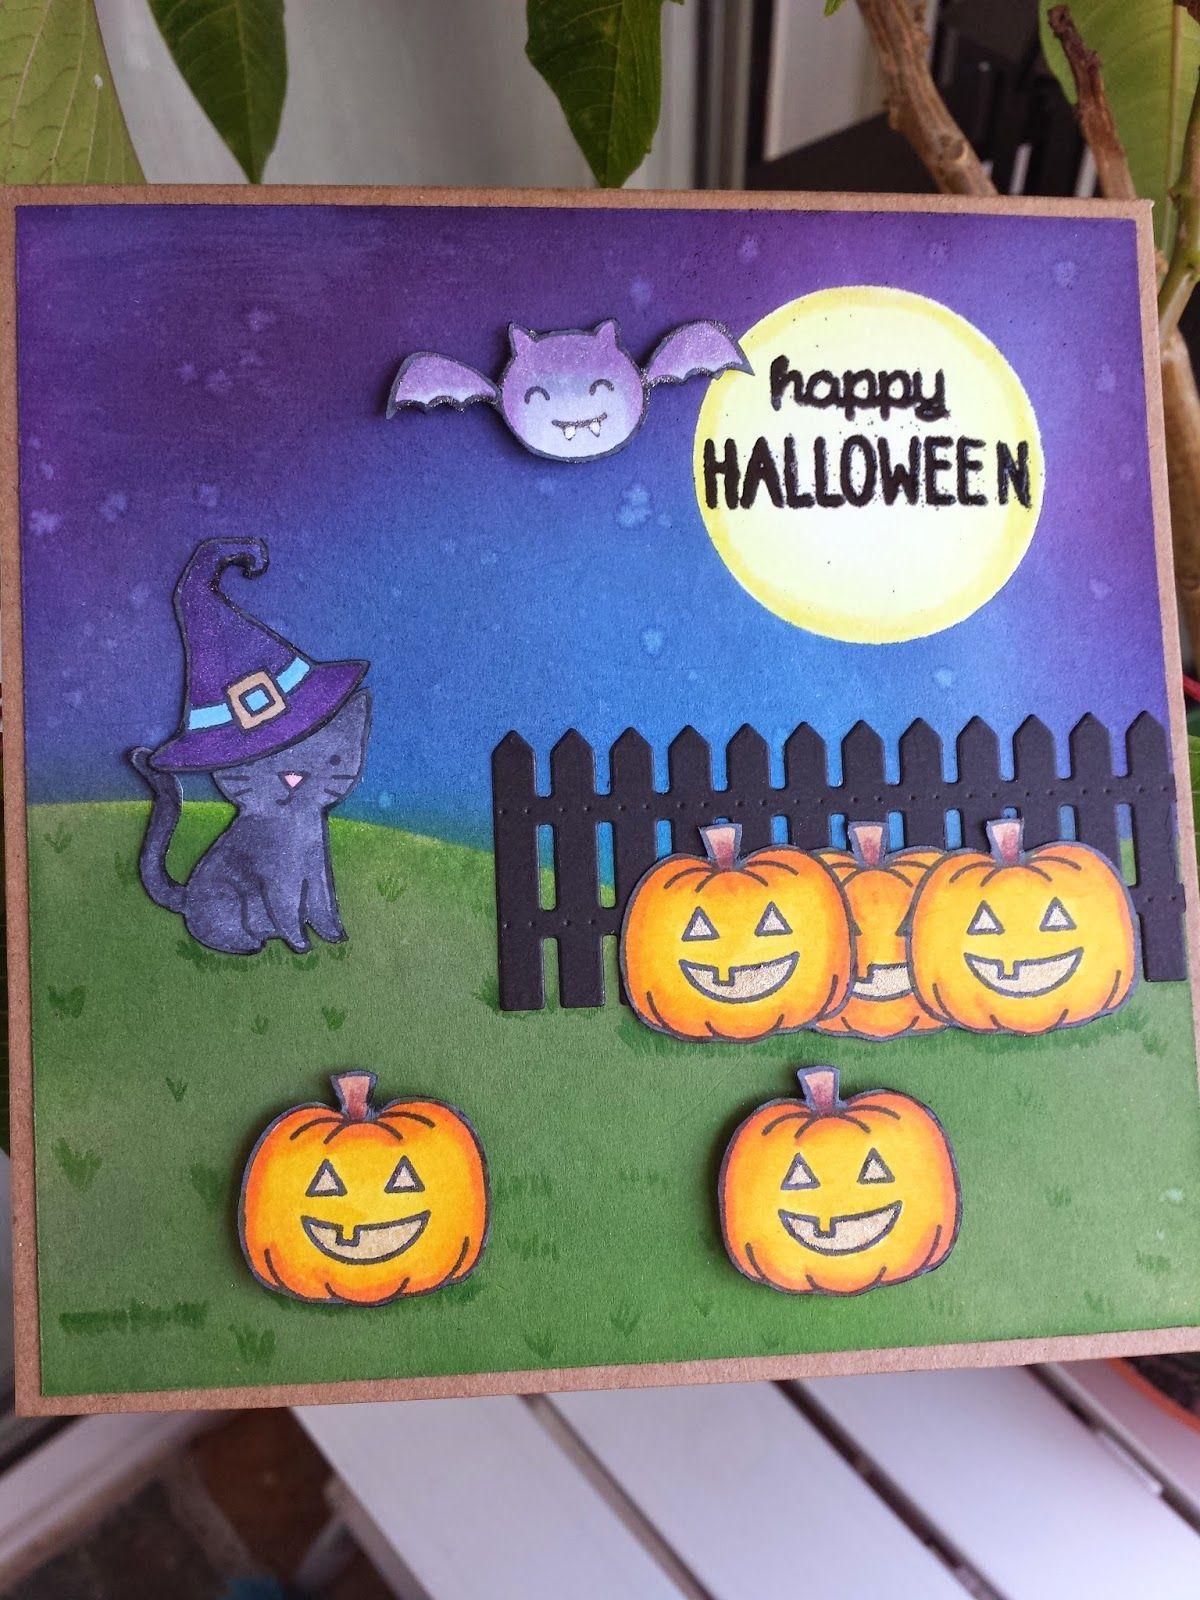 Lawn Fawn - Spooktacular _ Halloween Card By Esther At Arcadia De Papel:  Tarjeta Halloween Con Calabazas. Sellos De Lawn Fawn